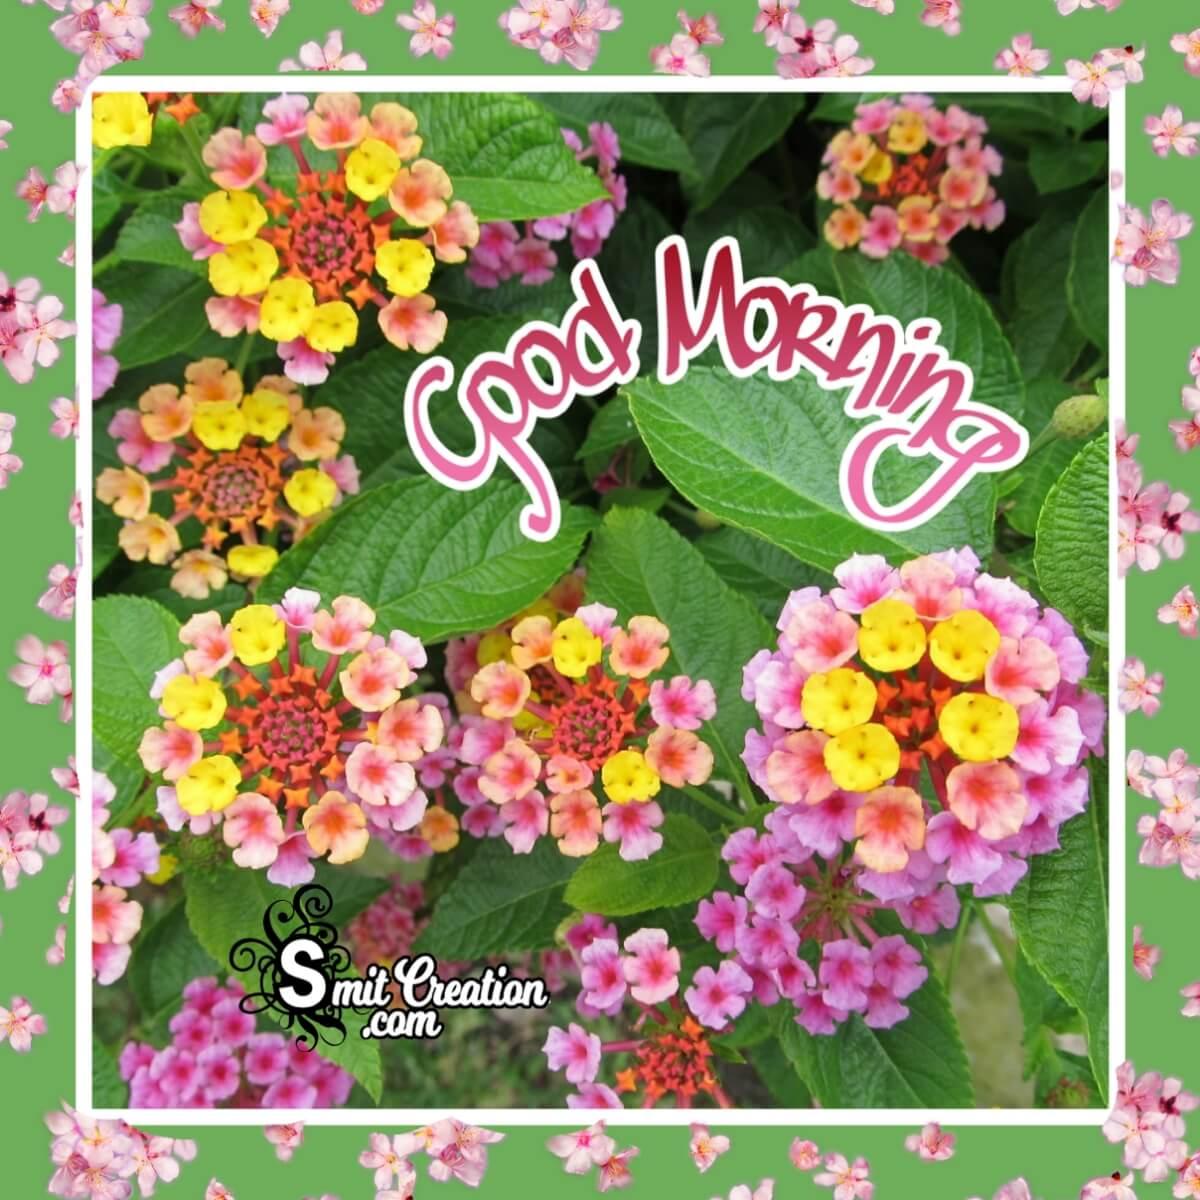 Good Morning Lantana Flowers Image